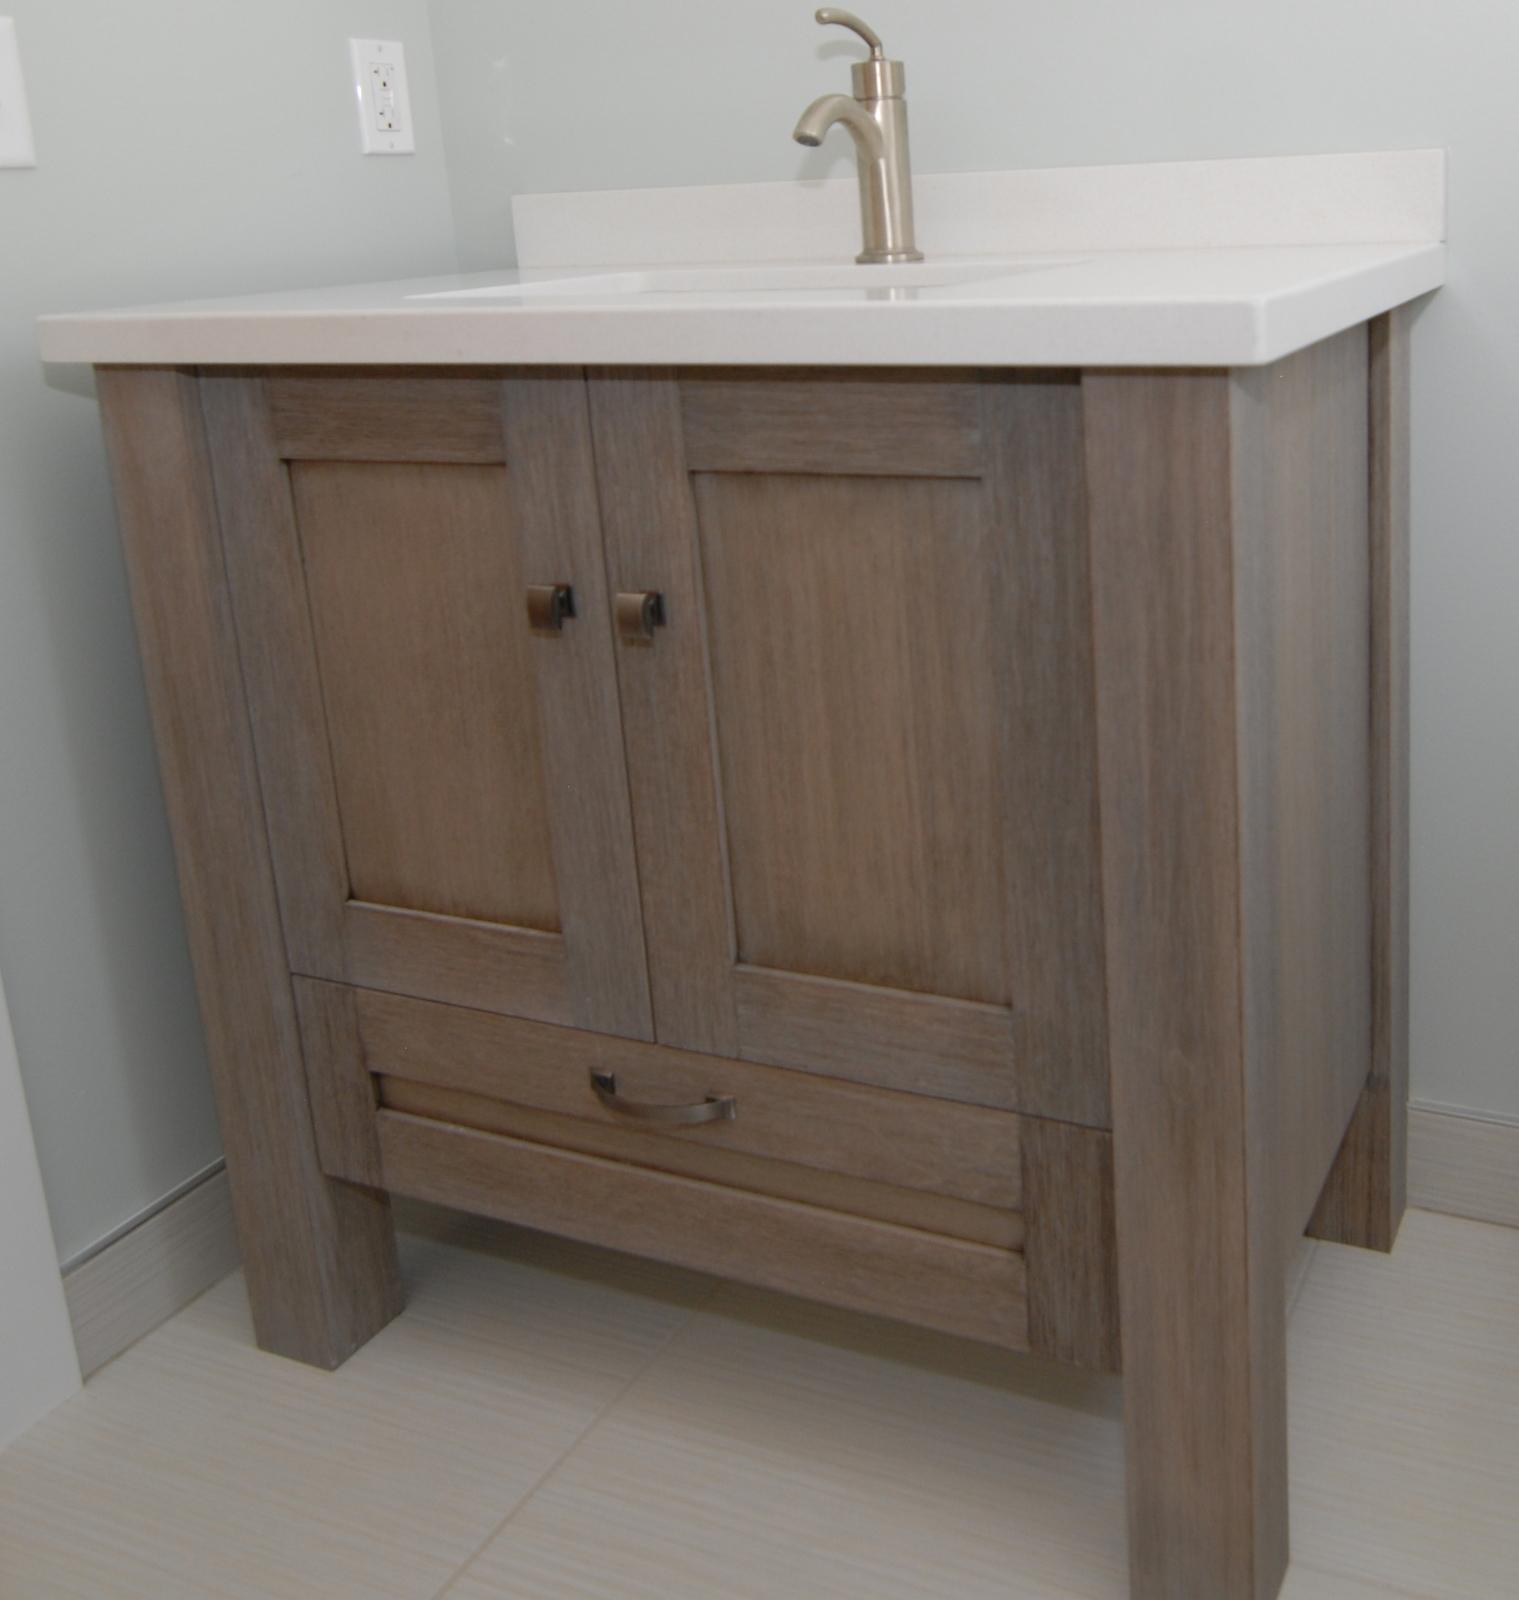 Enzy Living: Basement Bathroom After Photos